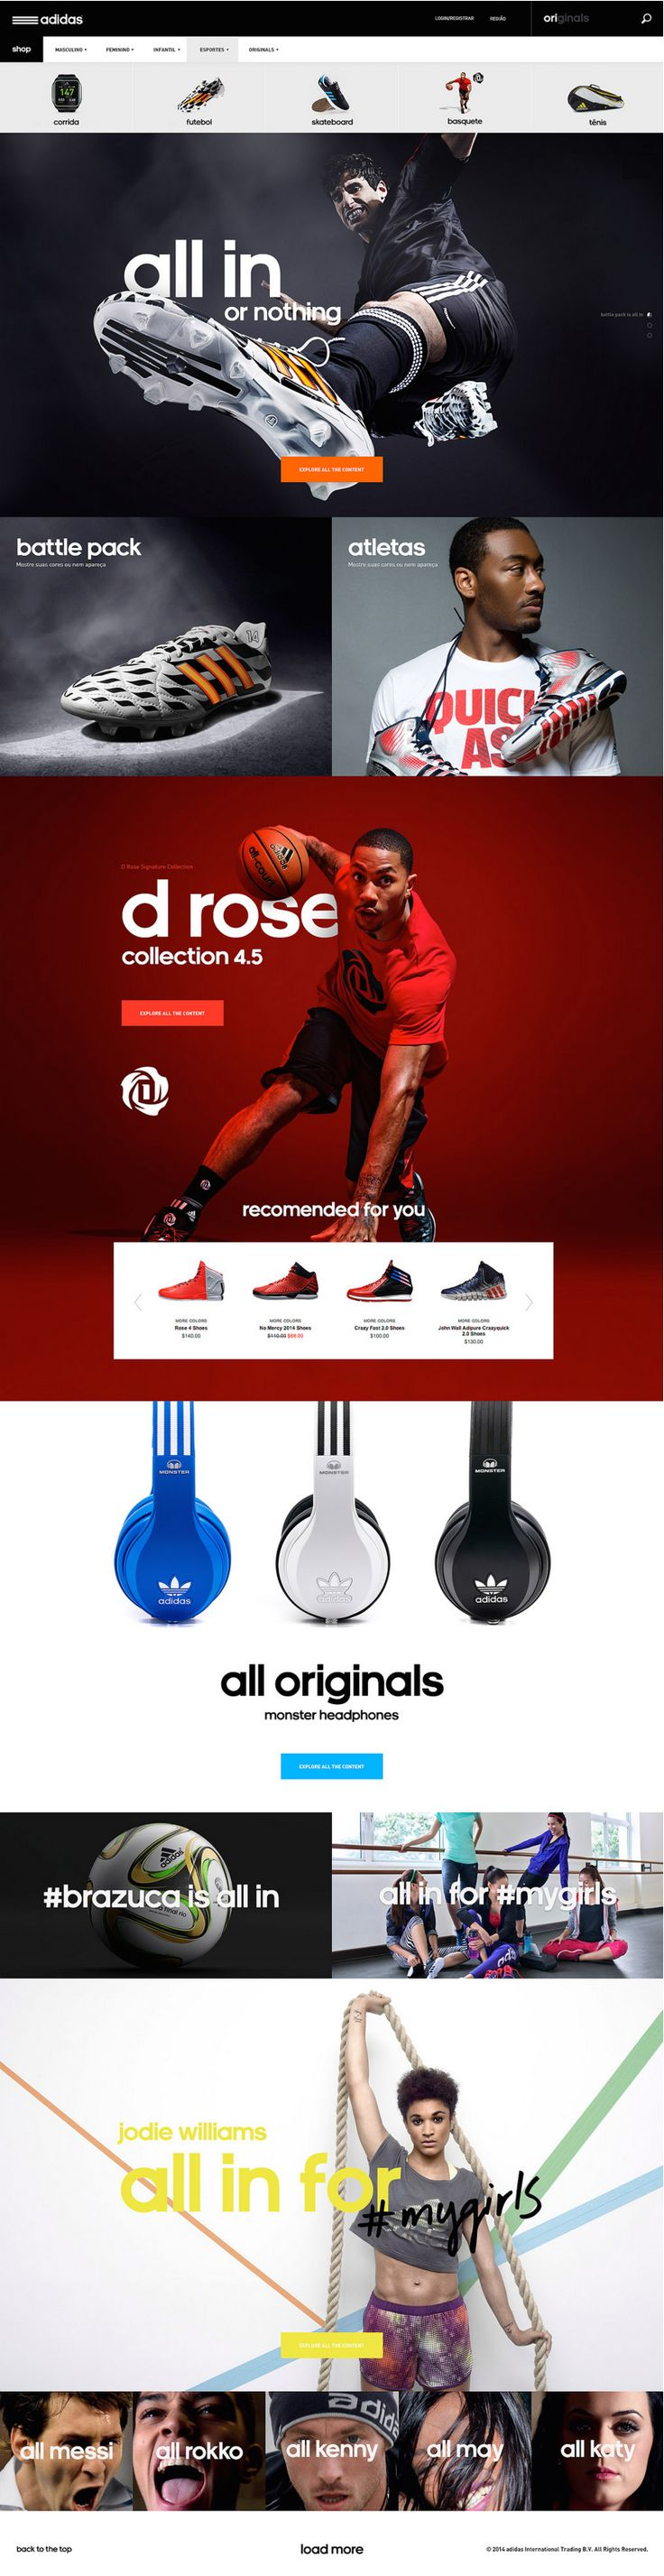 Adidas #webdesign #website #inspiration #layout| Web design | Pinterest